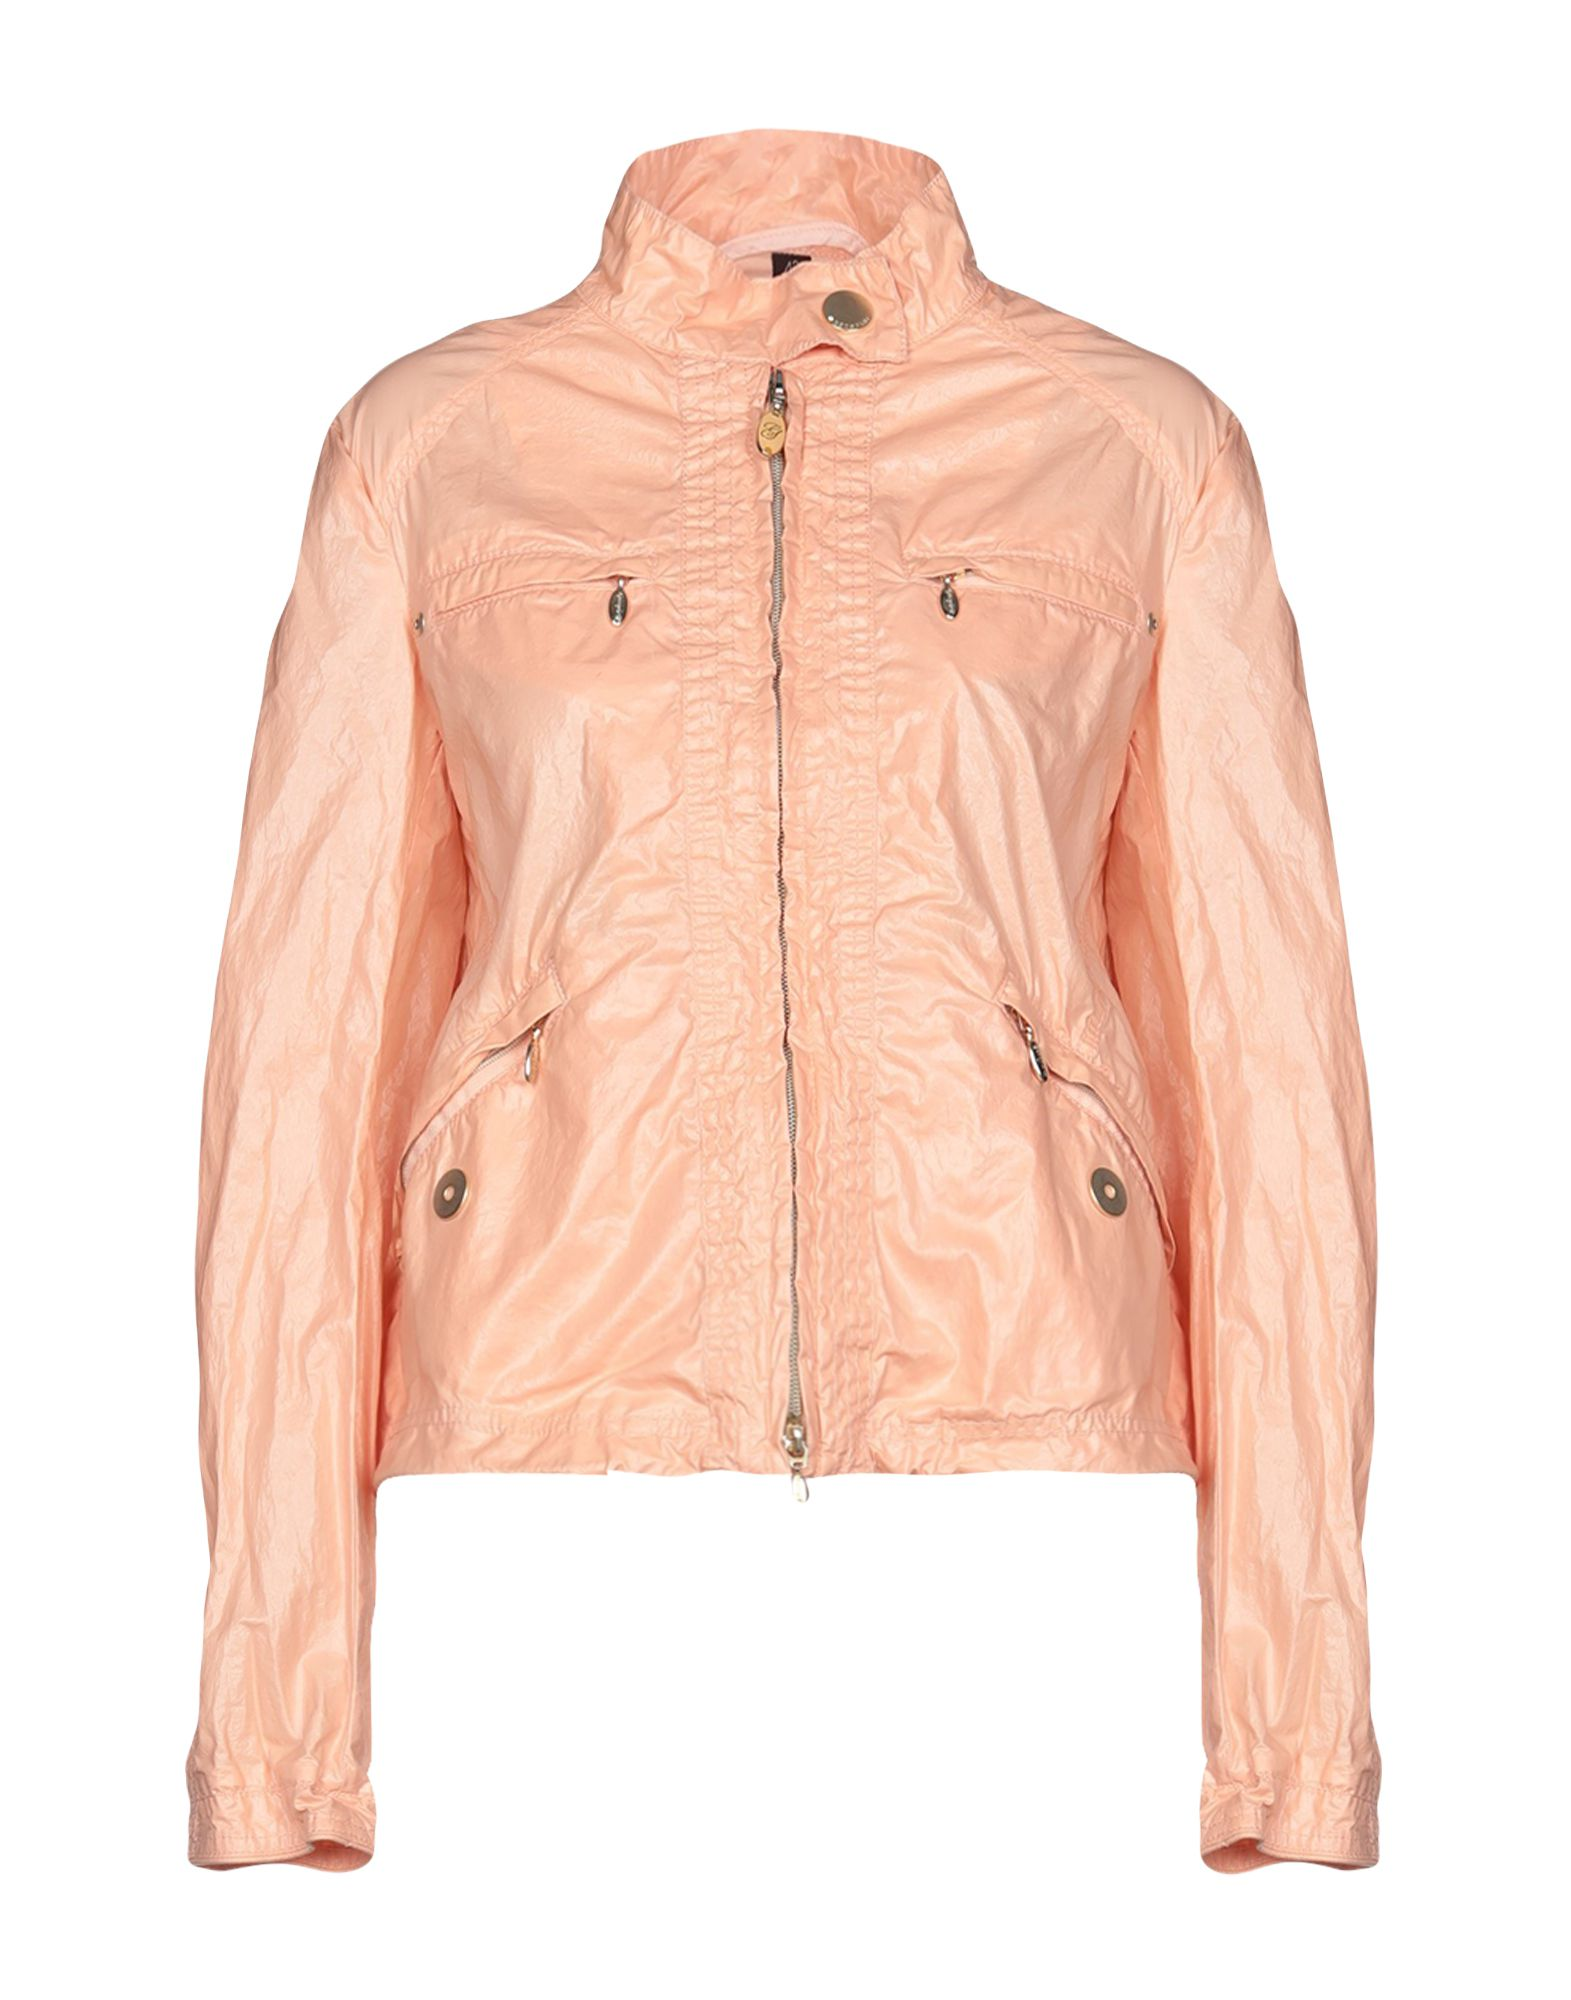 GEOSPIRIT Jackets in Salmon Pink